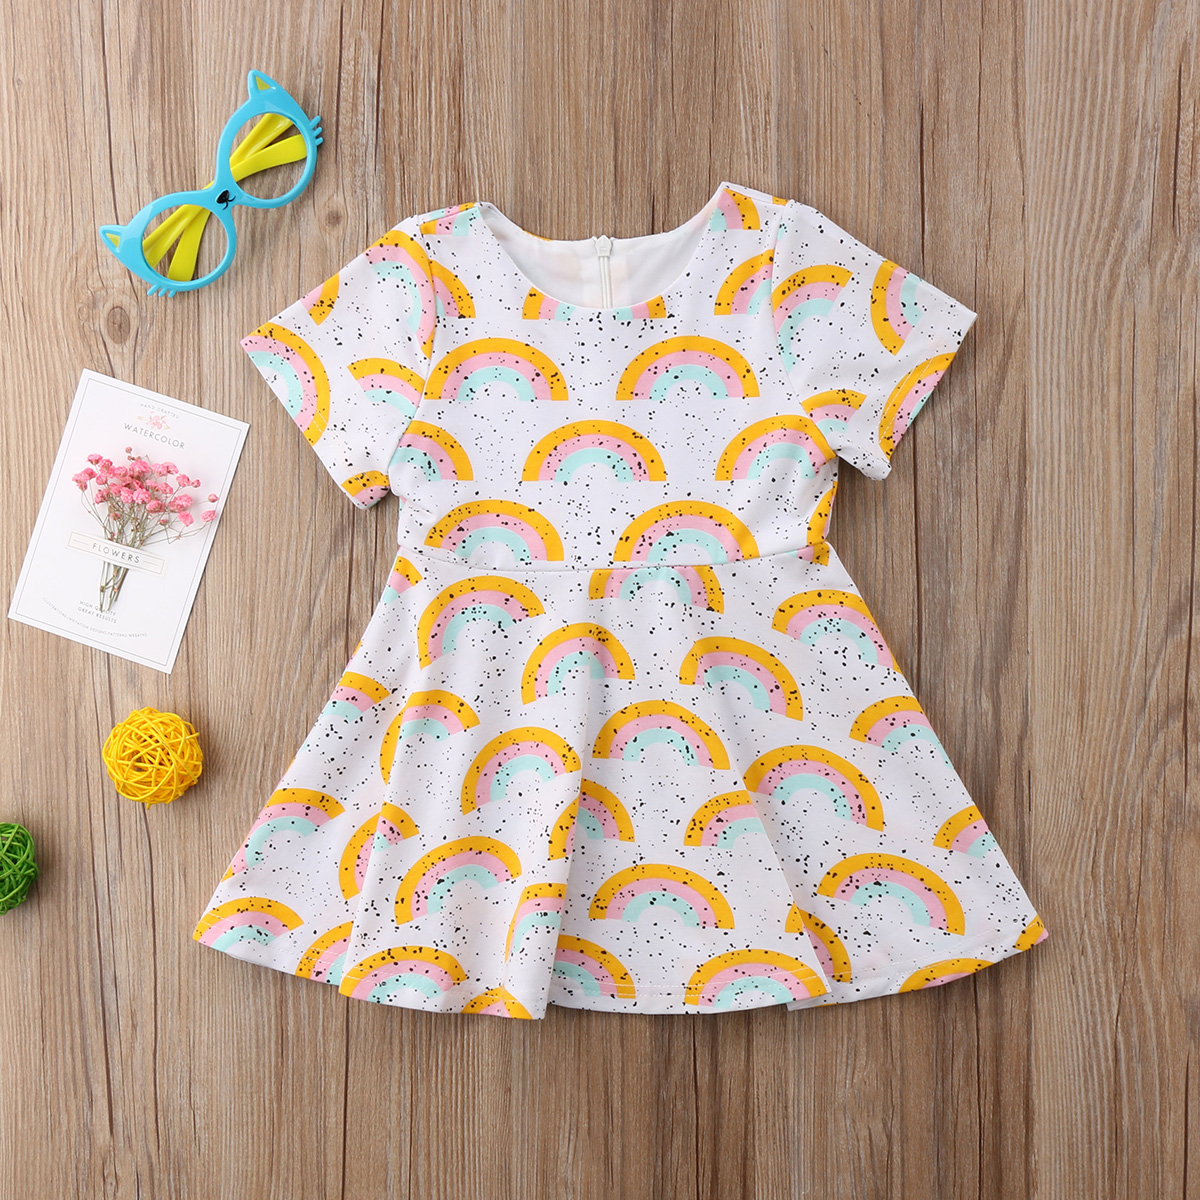 Koop Goedkoop Pasgeboren Kids Baby Meisje Zomer Korte Mouw Wit Korte Mouw Jurk Party Outfit Kleding 0-5y Voor 1-5y Yu